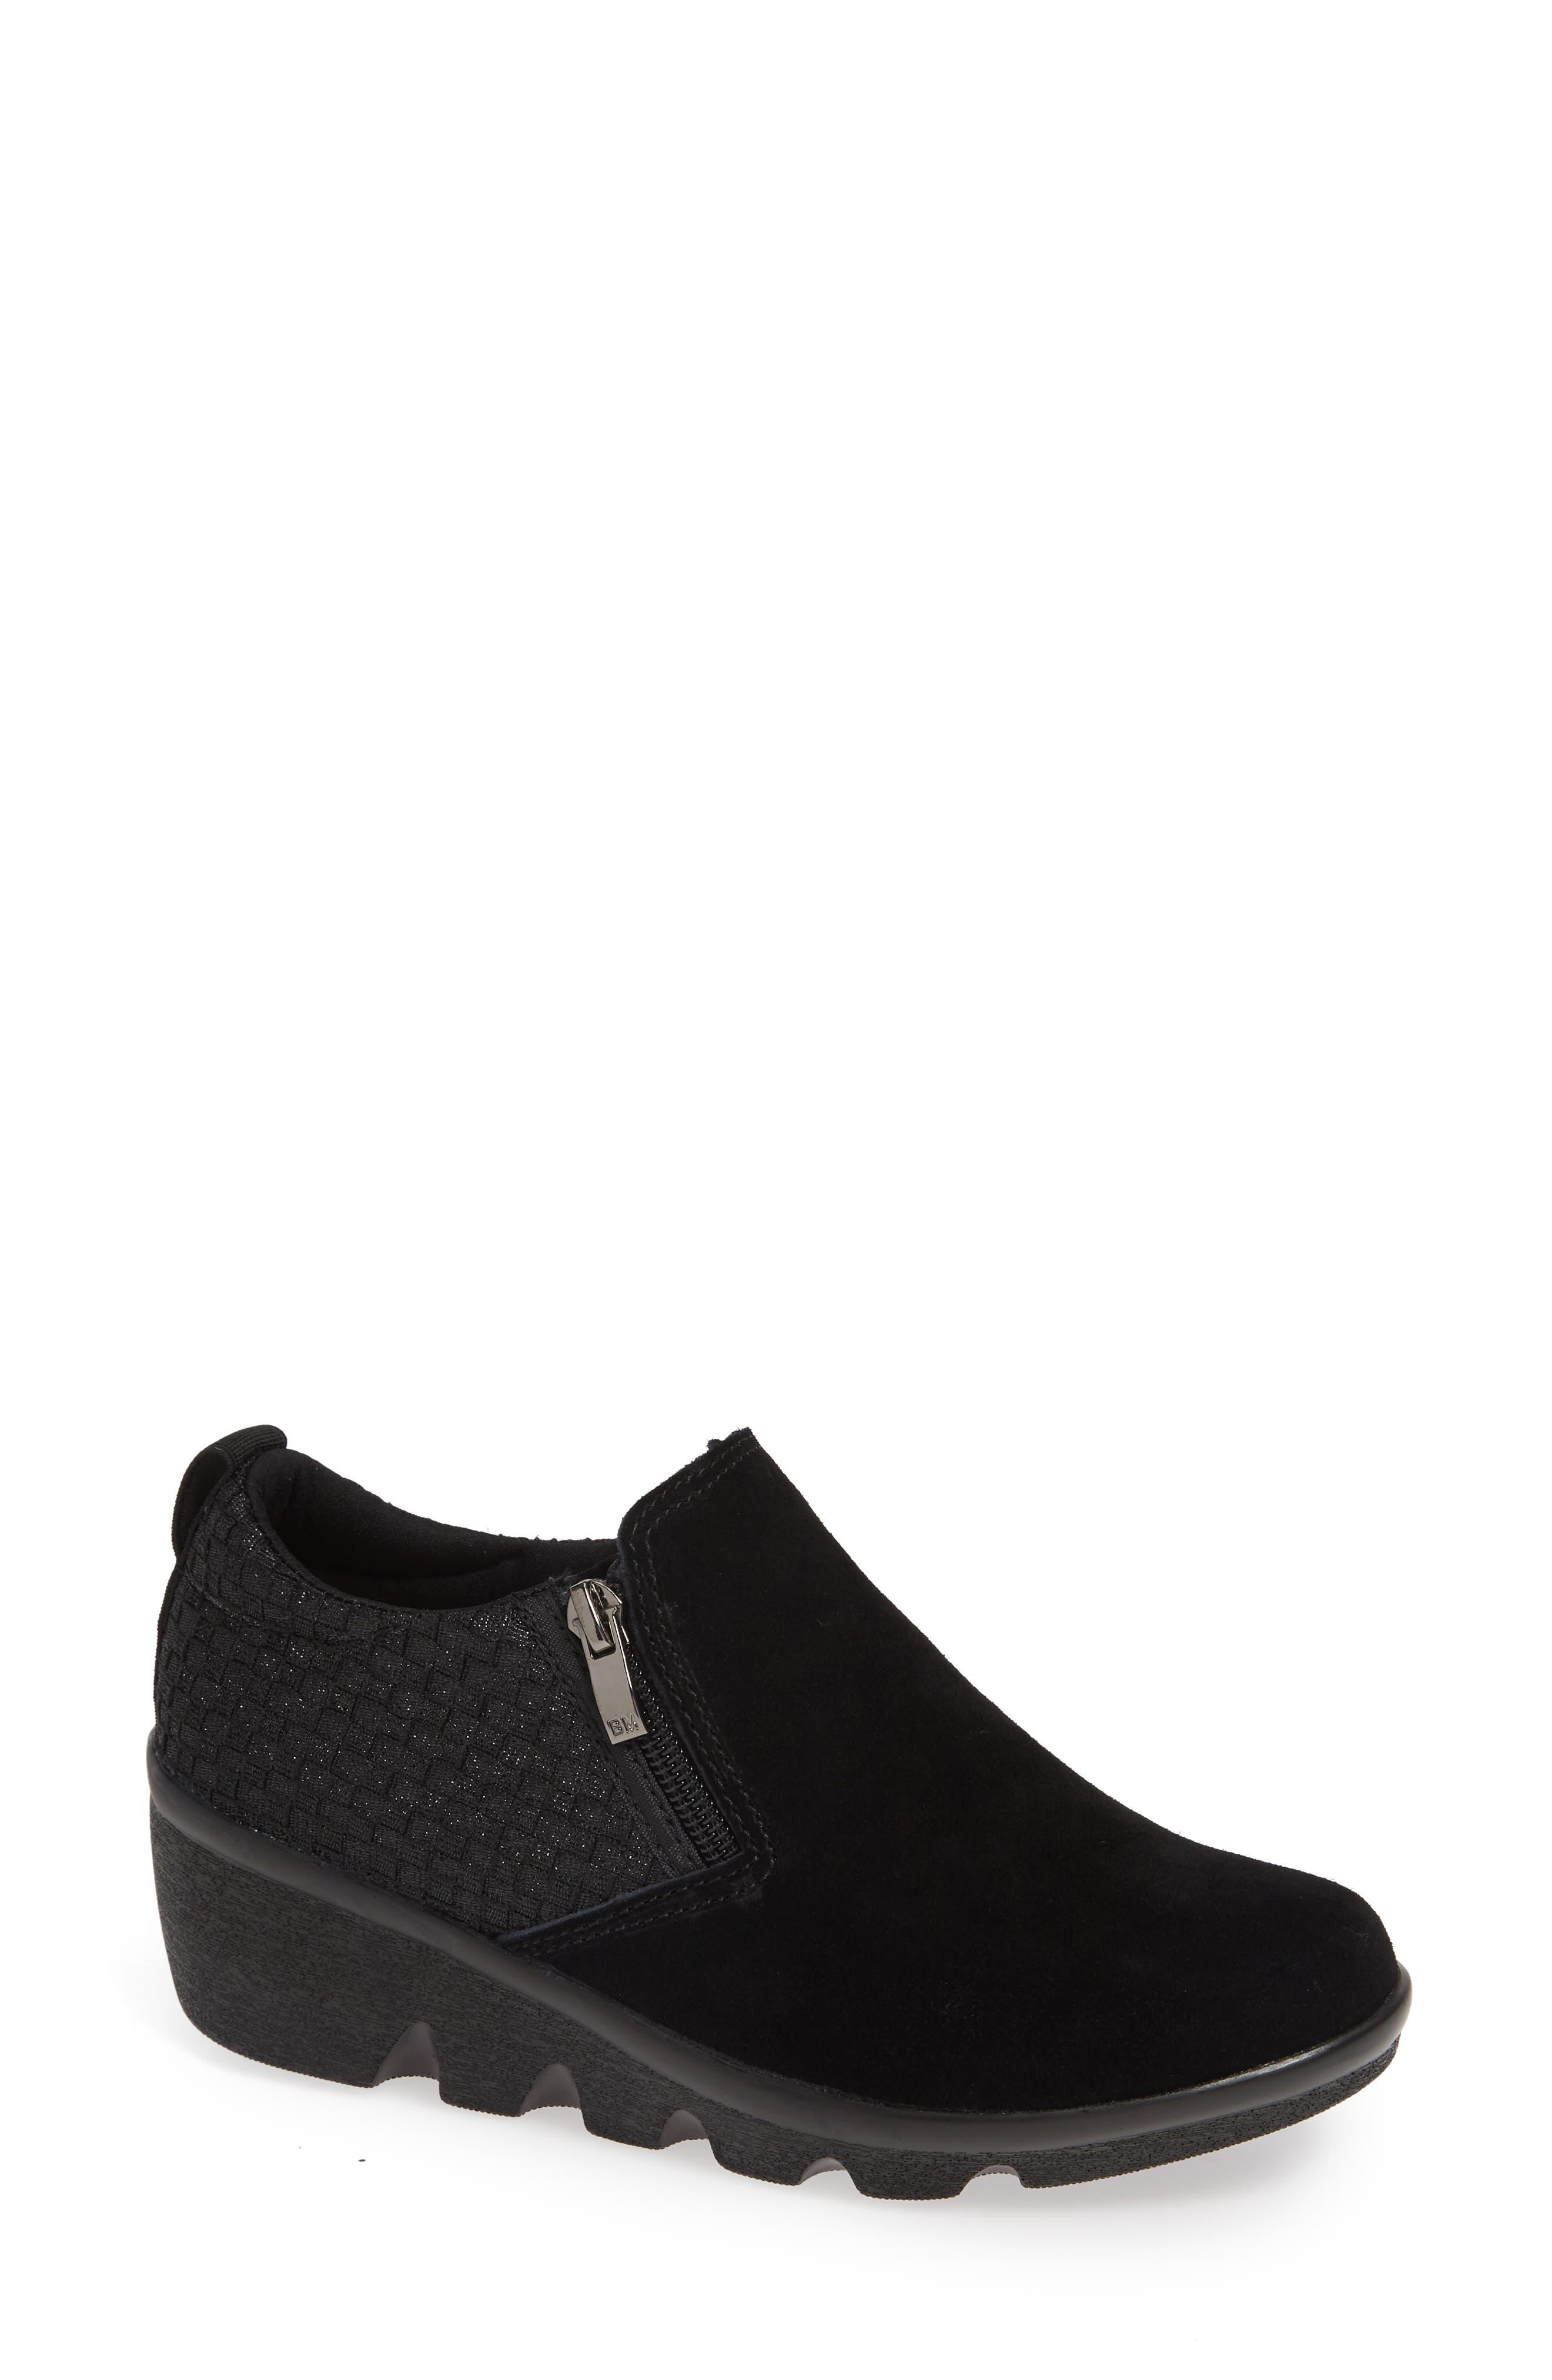 Bernie Mev. Lihi Ankle Boot, Black